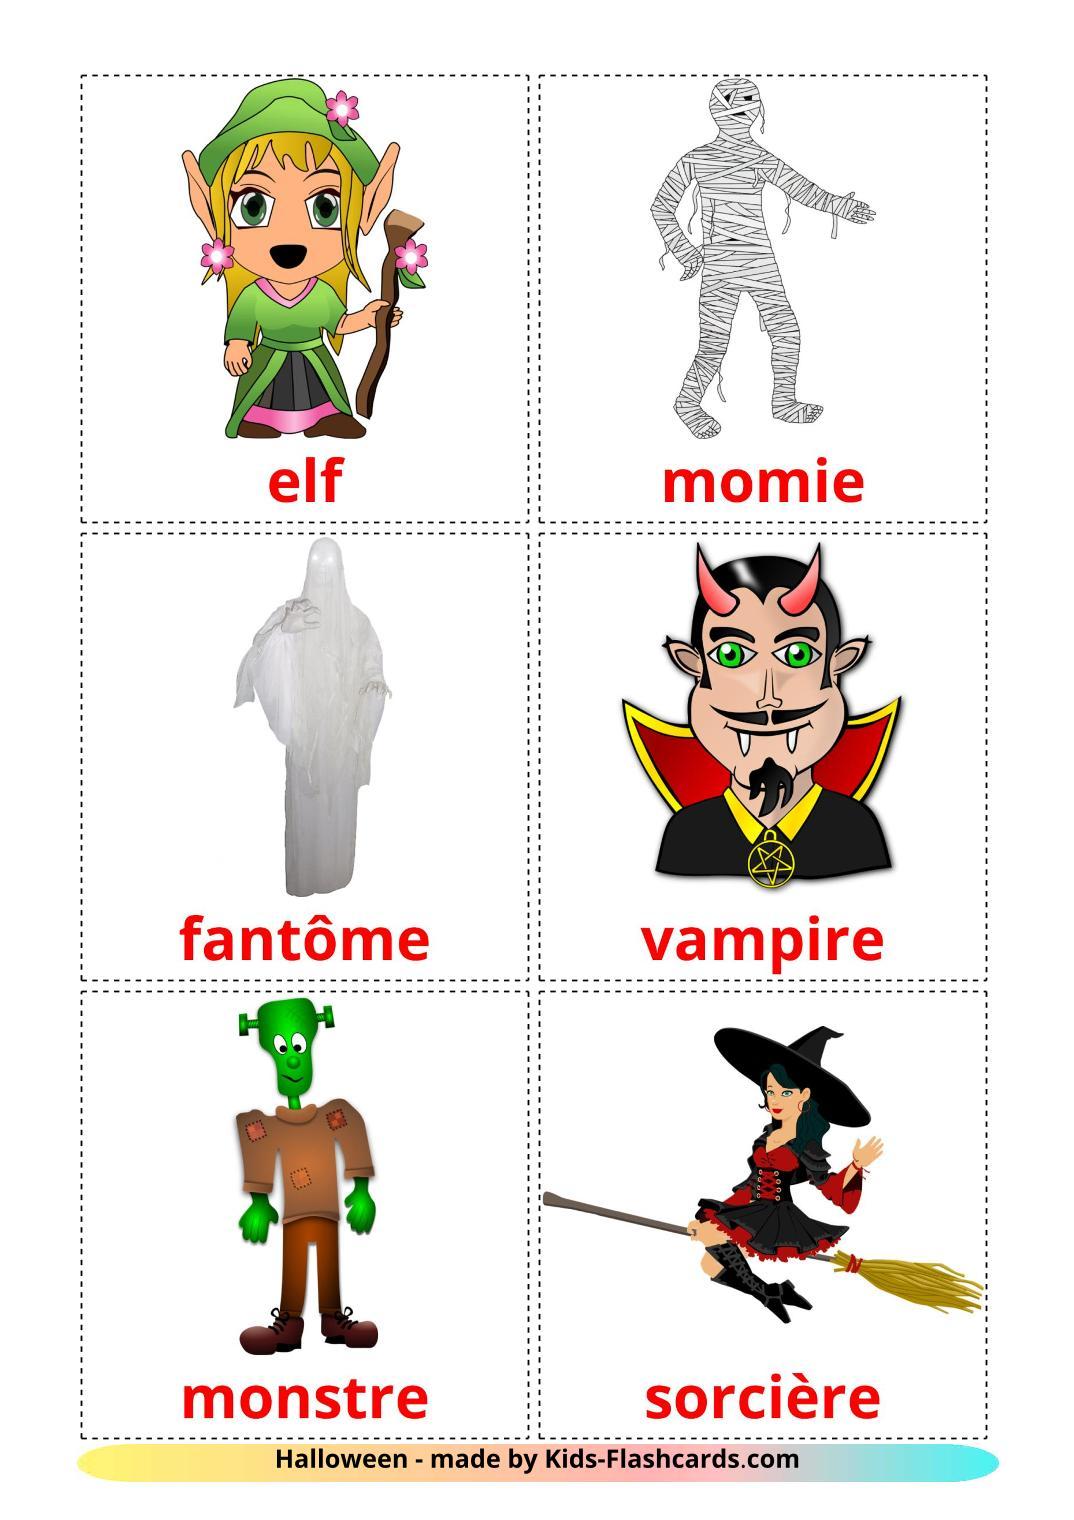 Halloween - 16 Free Printable french Flashcards